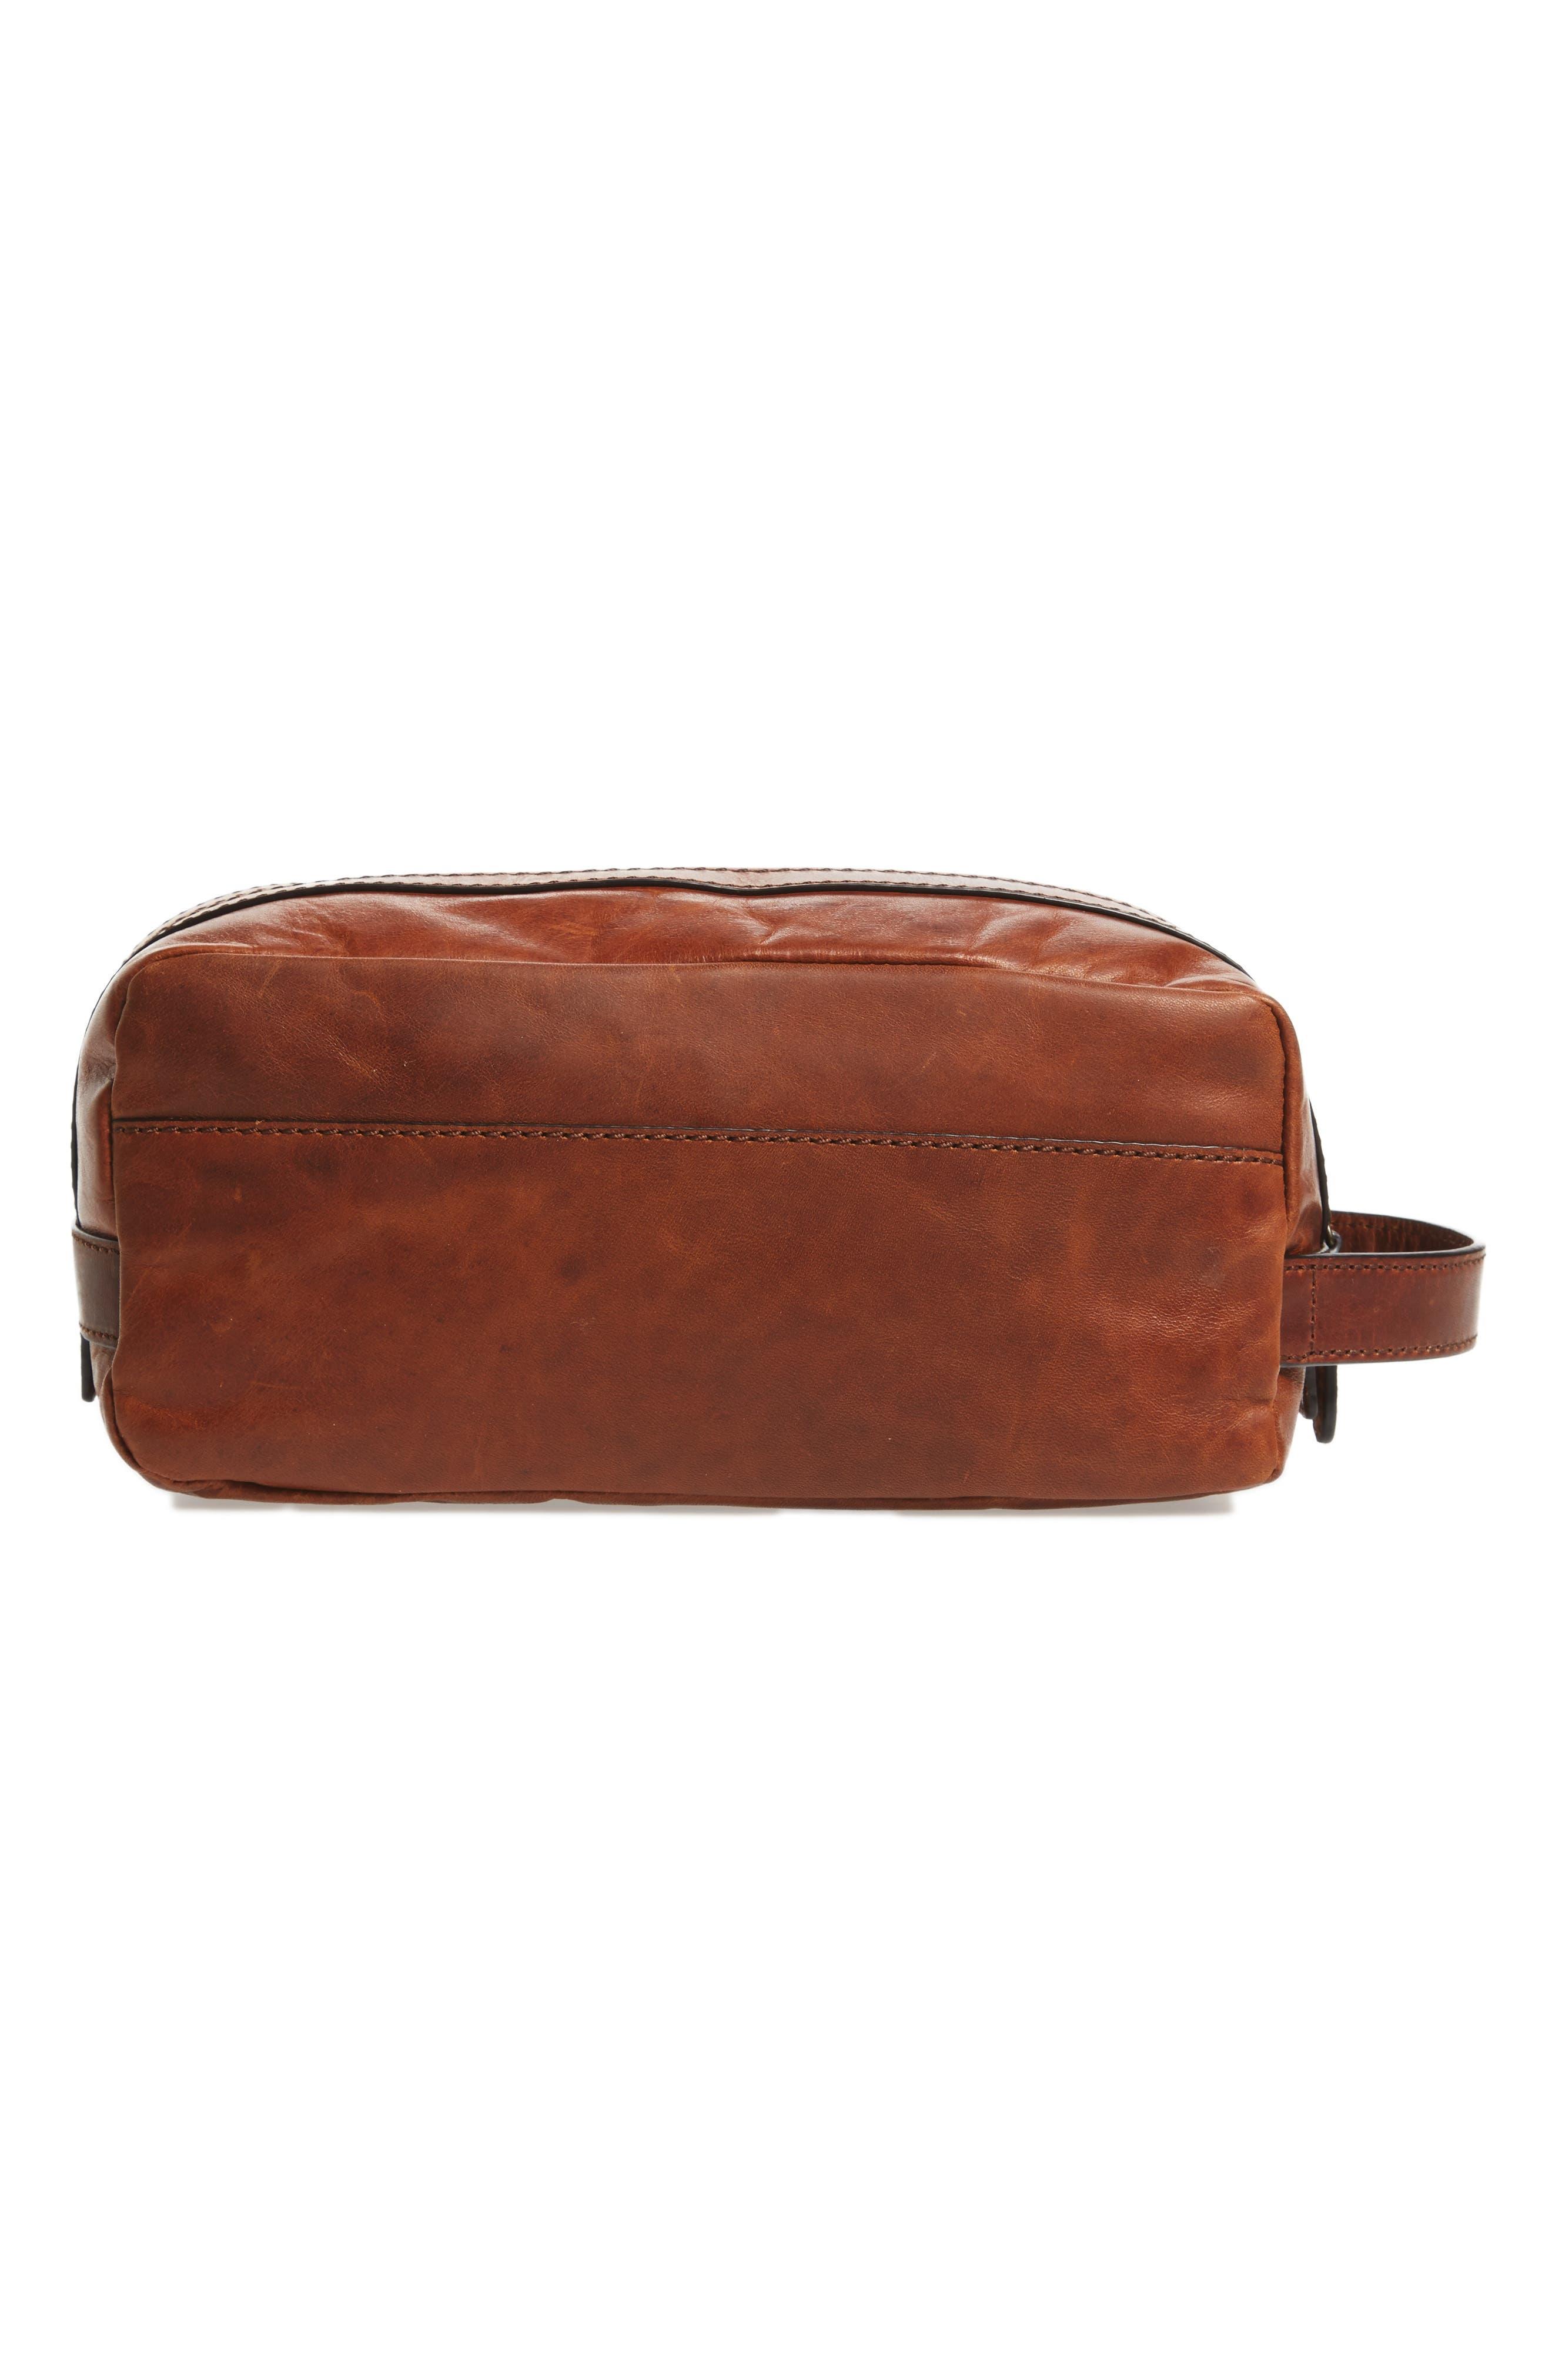 'Logan' Leather Travel Kit,                             Alternate thumbnail 2, color,                             Cognac